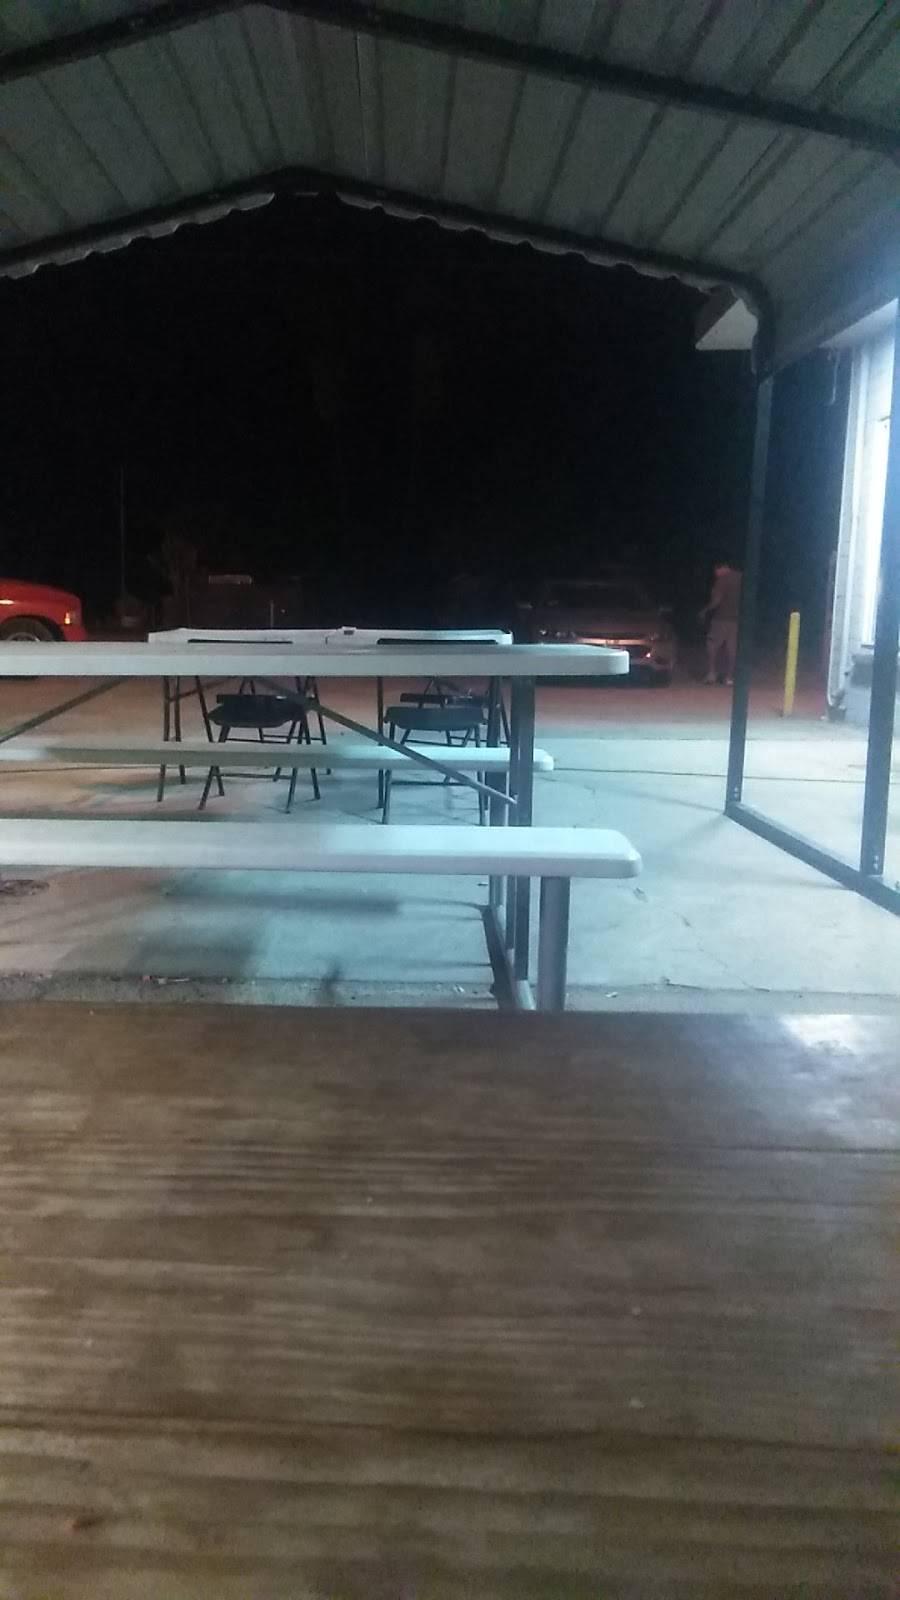 Tacos Cojumatlan | restaurant | 22000, 22018 E Manning Ave, Reedley, CA 93654, USA | 5597372602 OR +1 559-737-2602